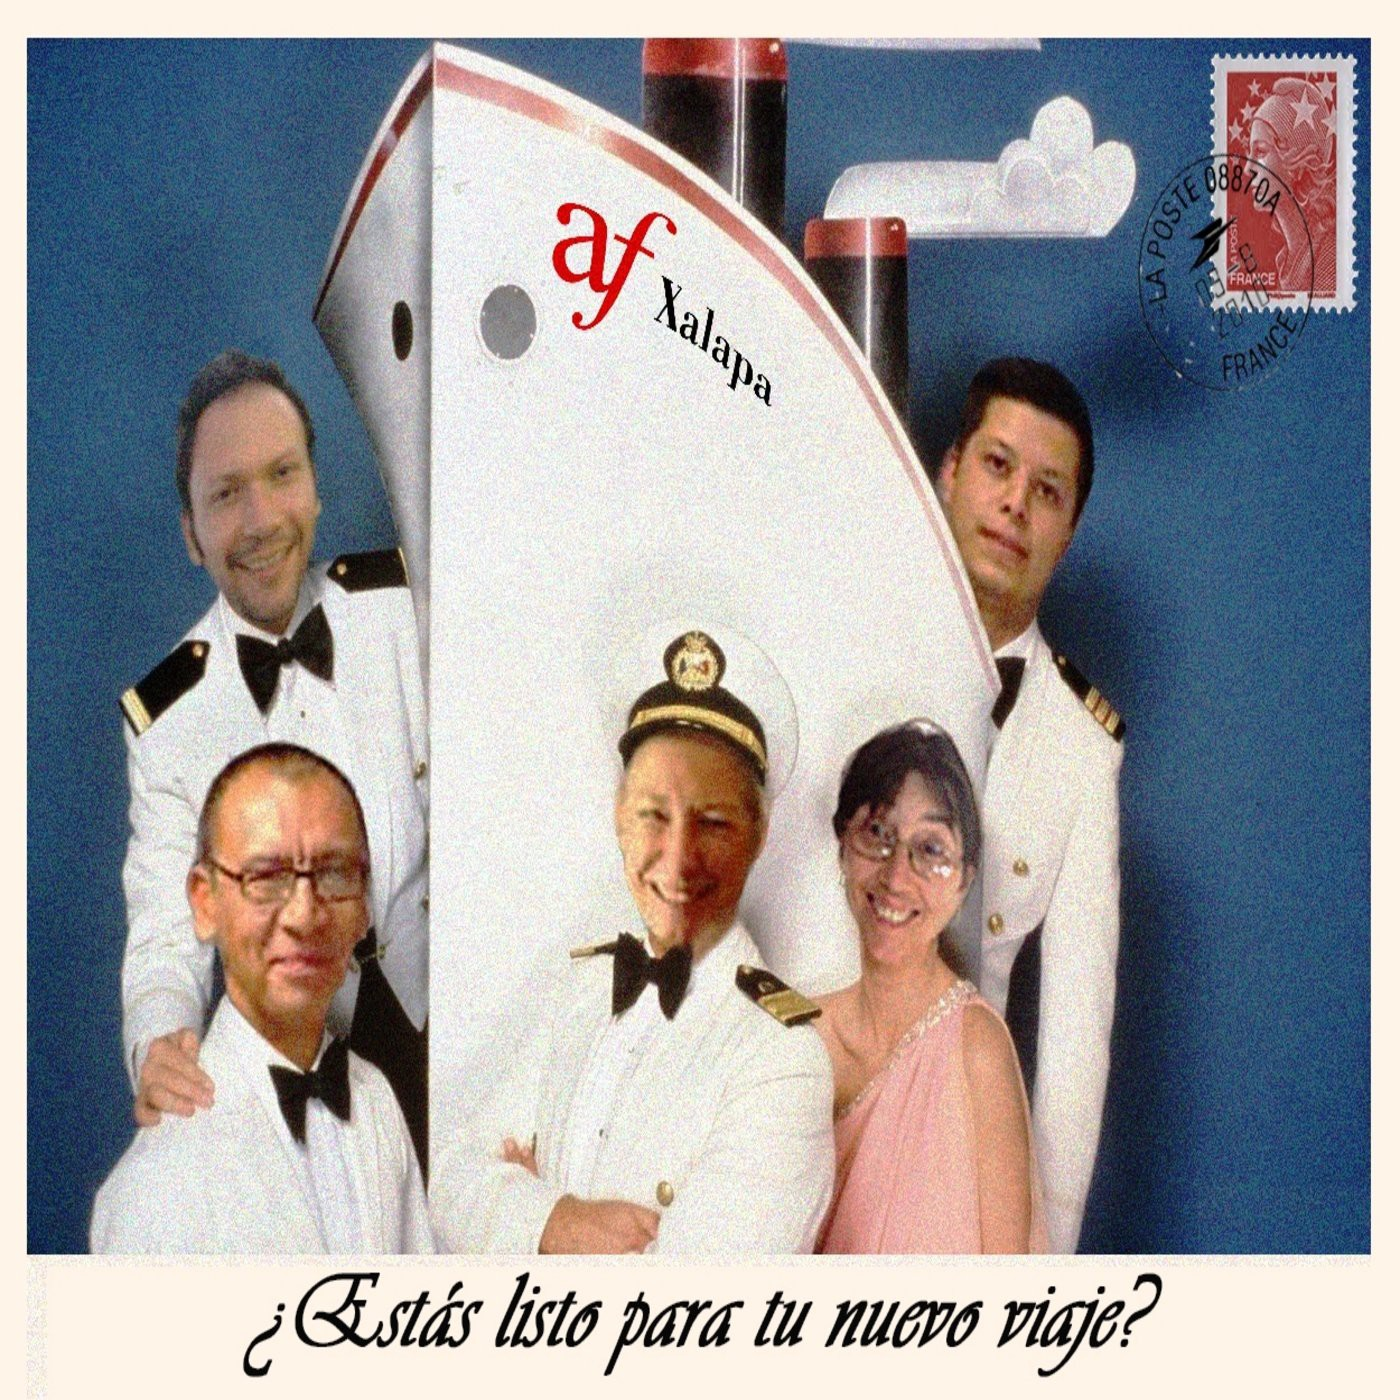 <![CDATA[Podcast de Fmc Alianza Francesa Xalapa]]>